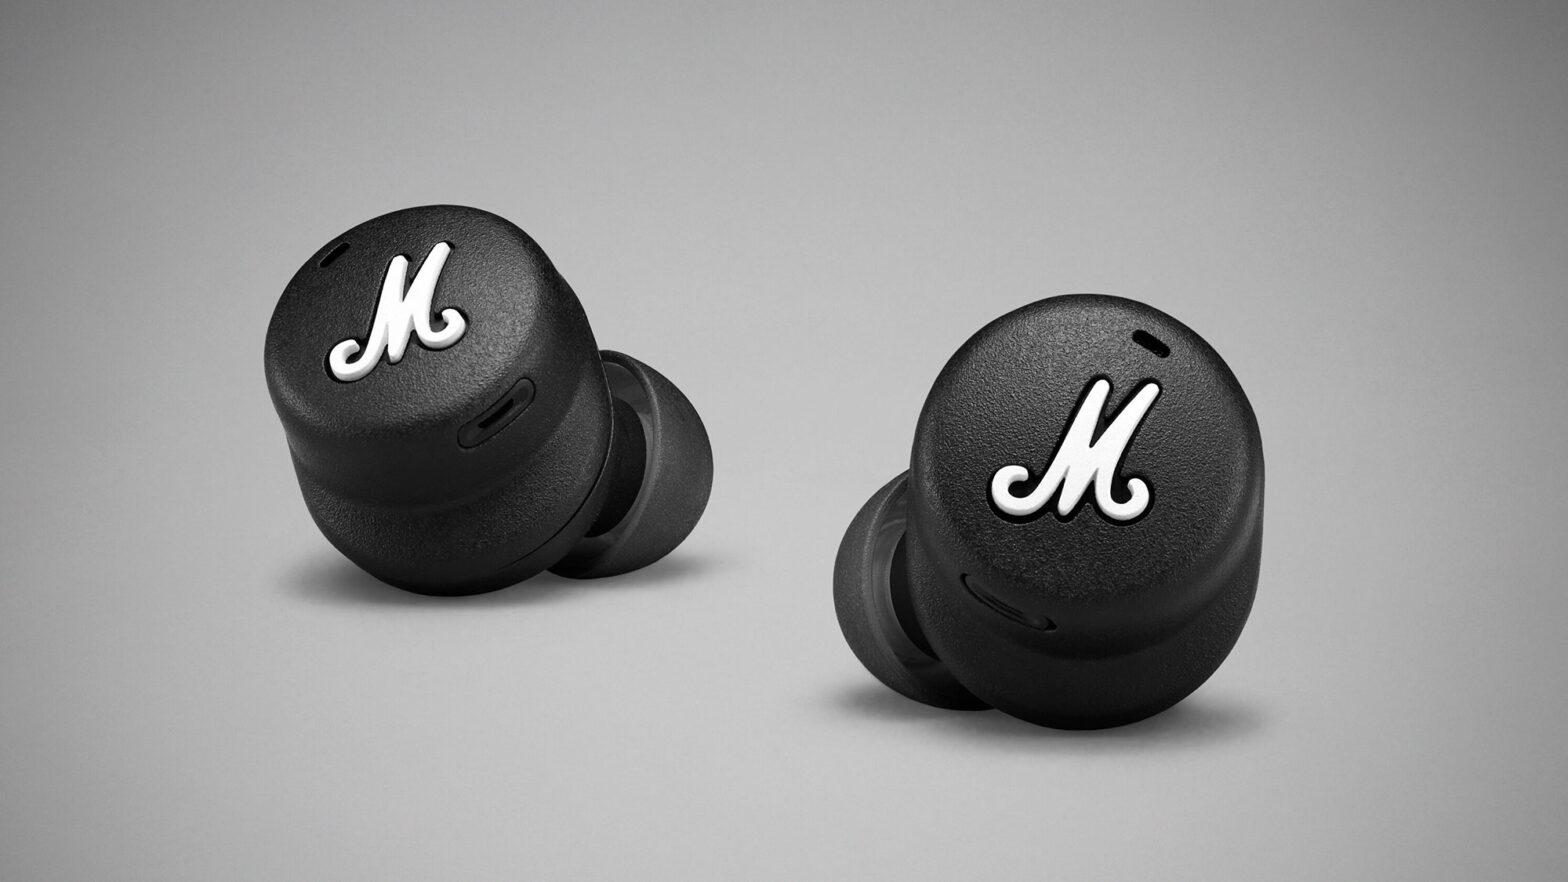 Marshall Mode II True Wireless Sound Earbuds